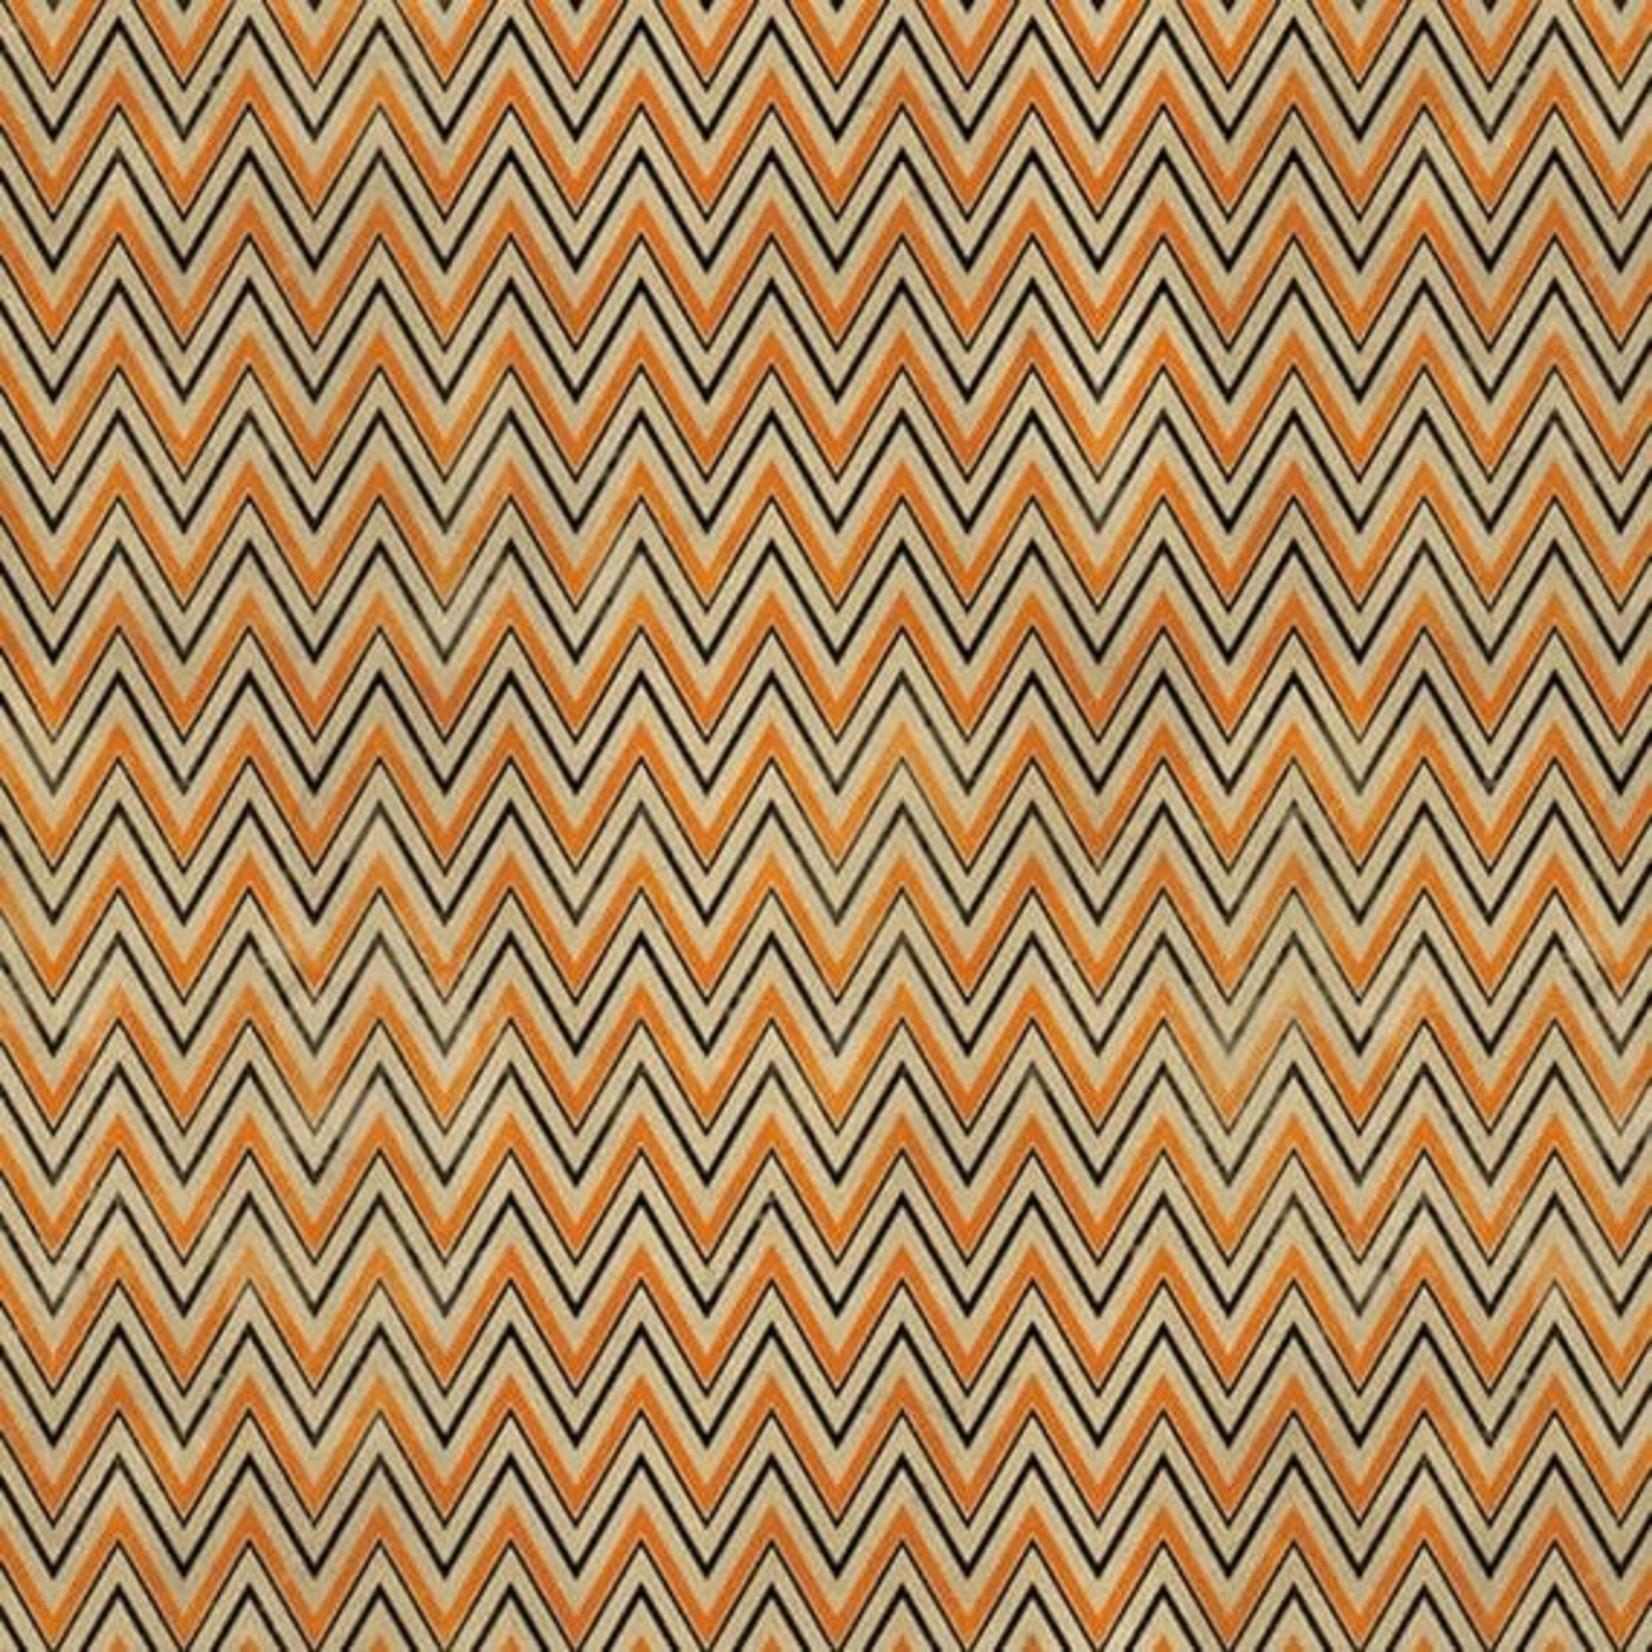 Tim Holtz Zig Zag - Orange, per cm or $16/m